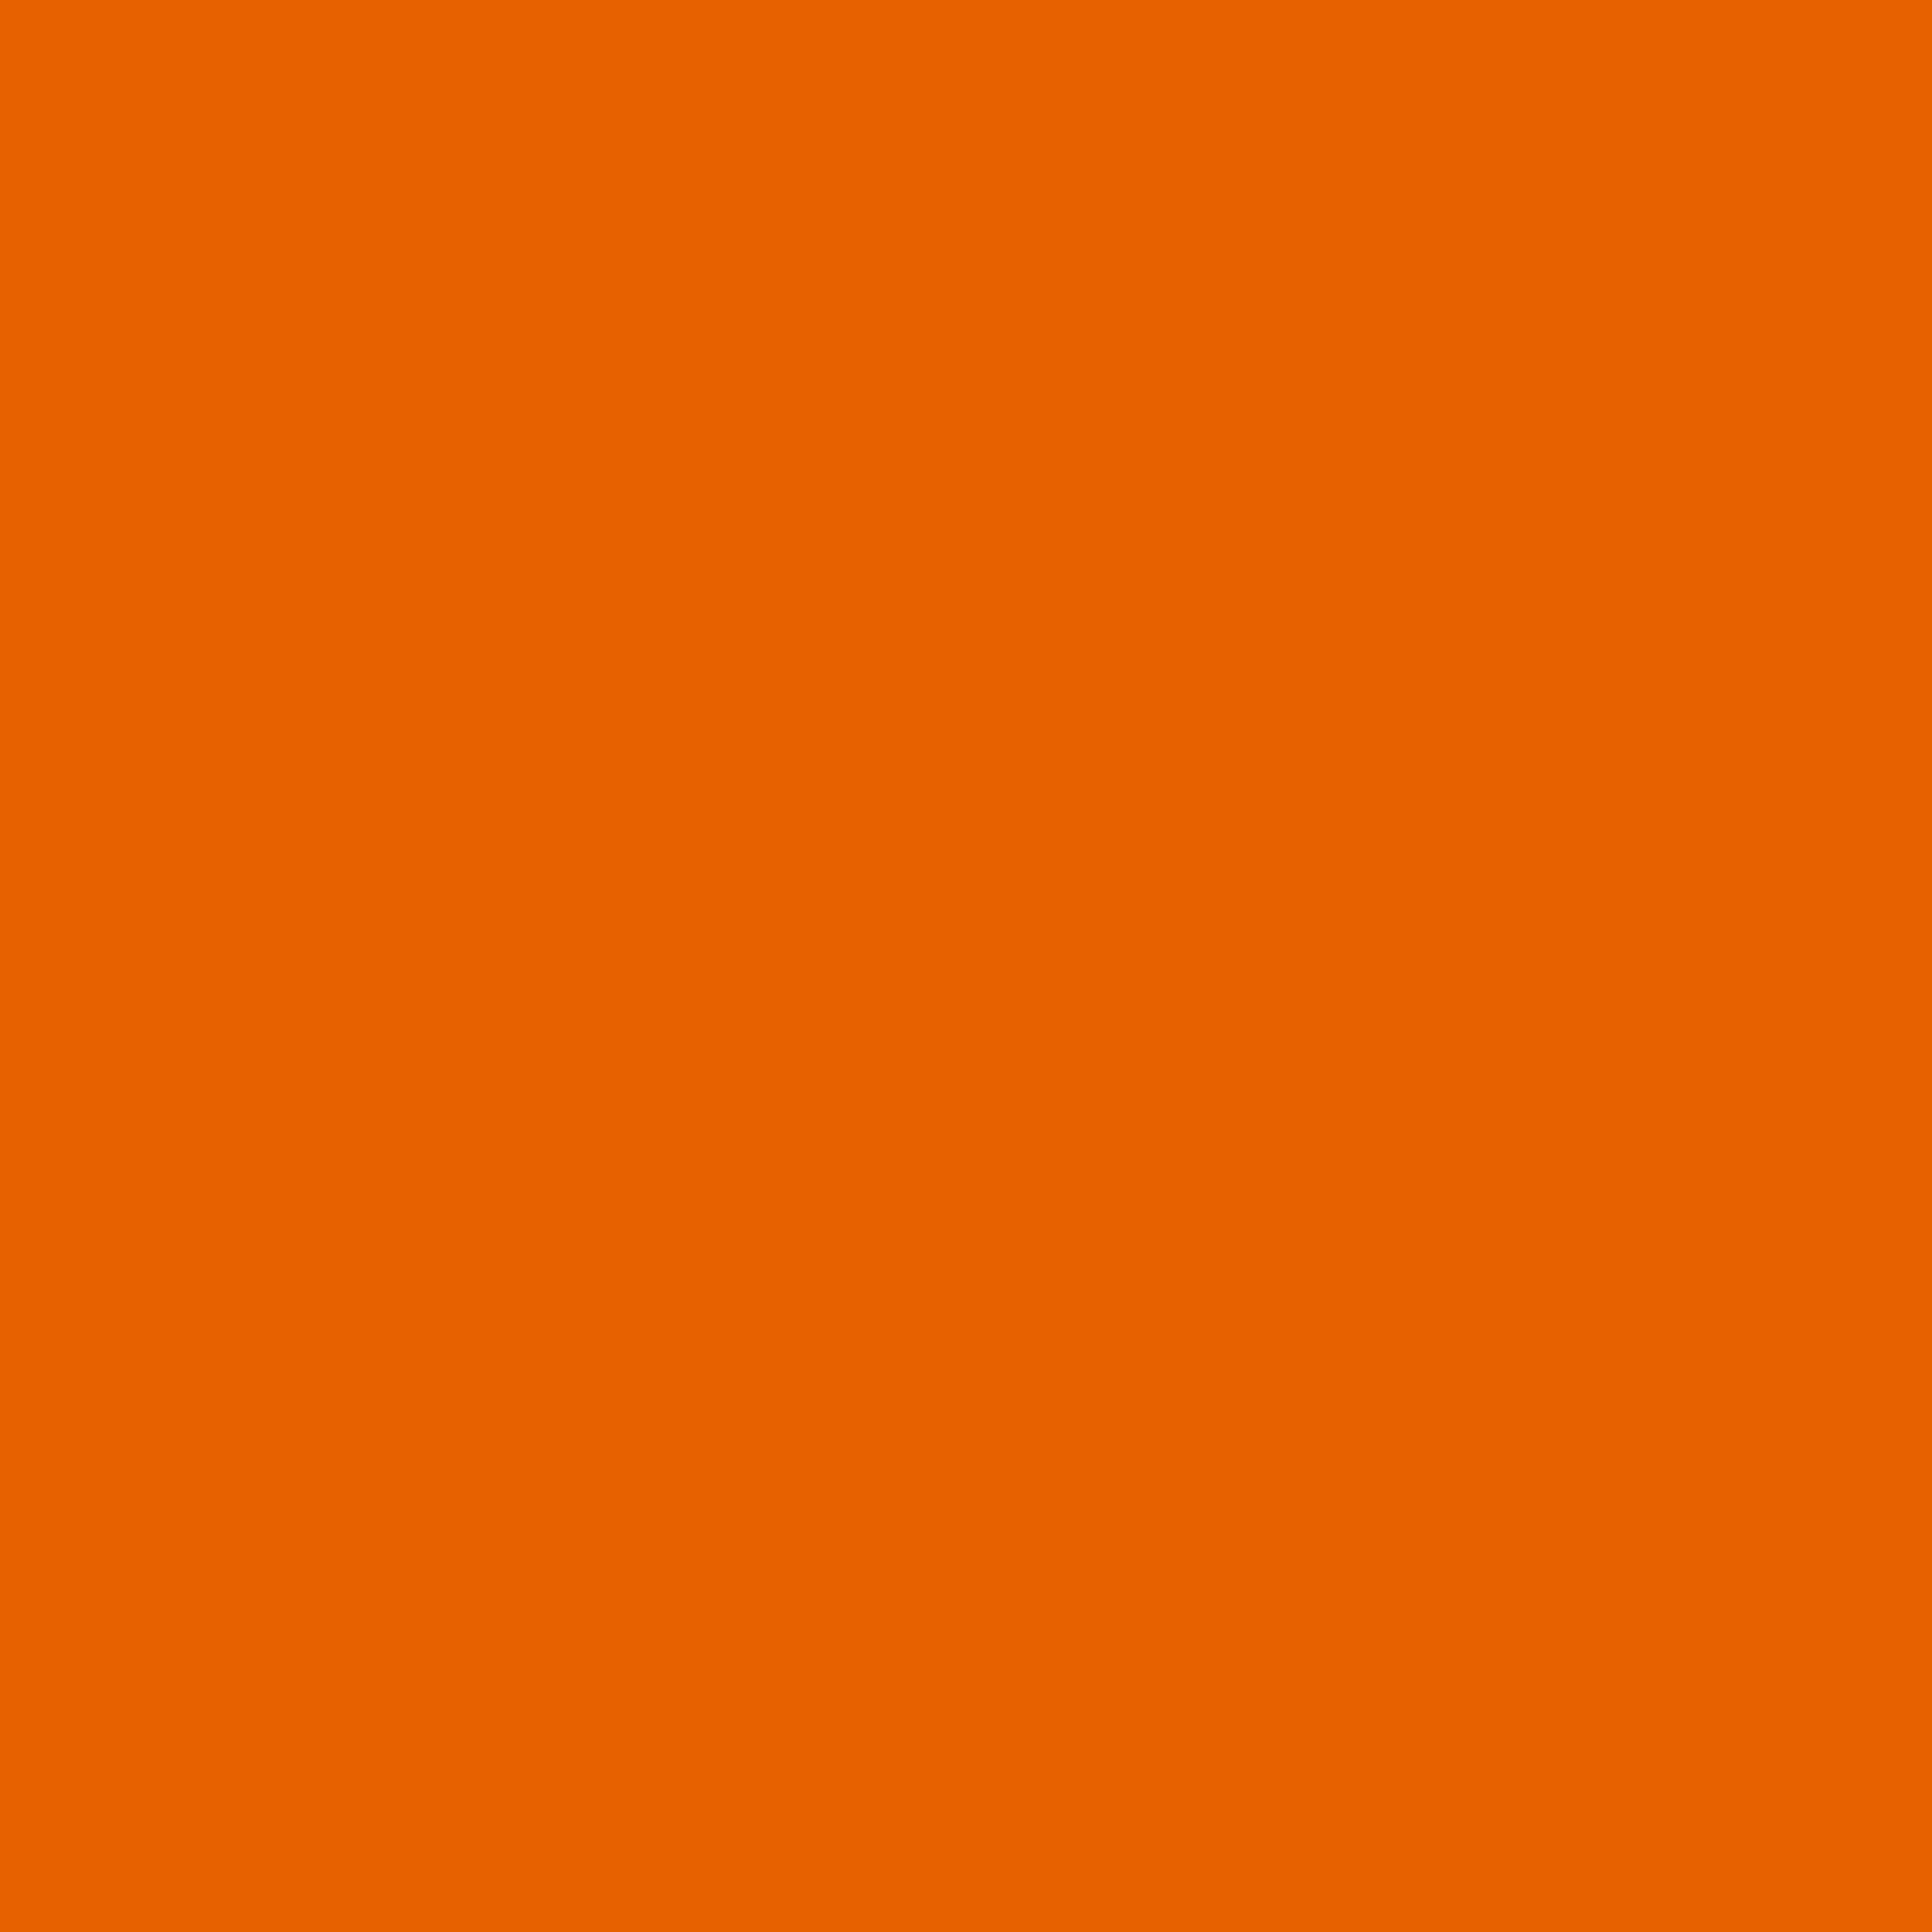 2048x2048 Spanish Orange Solid Color Background